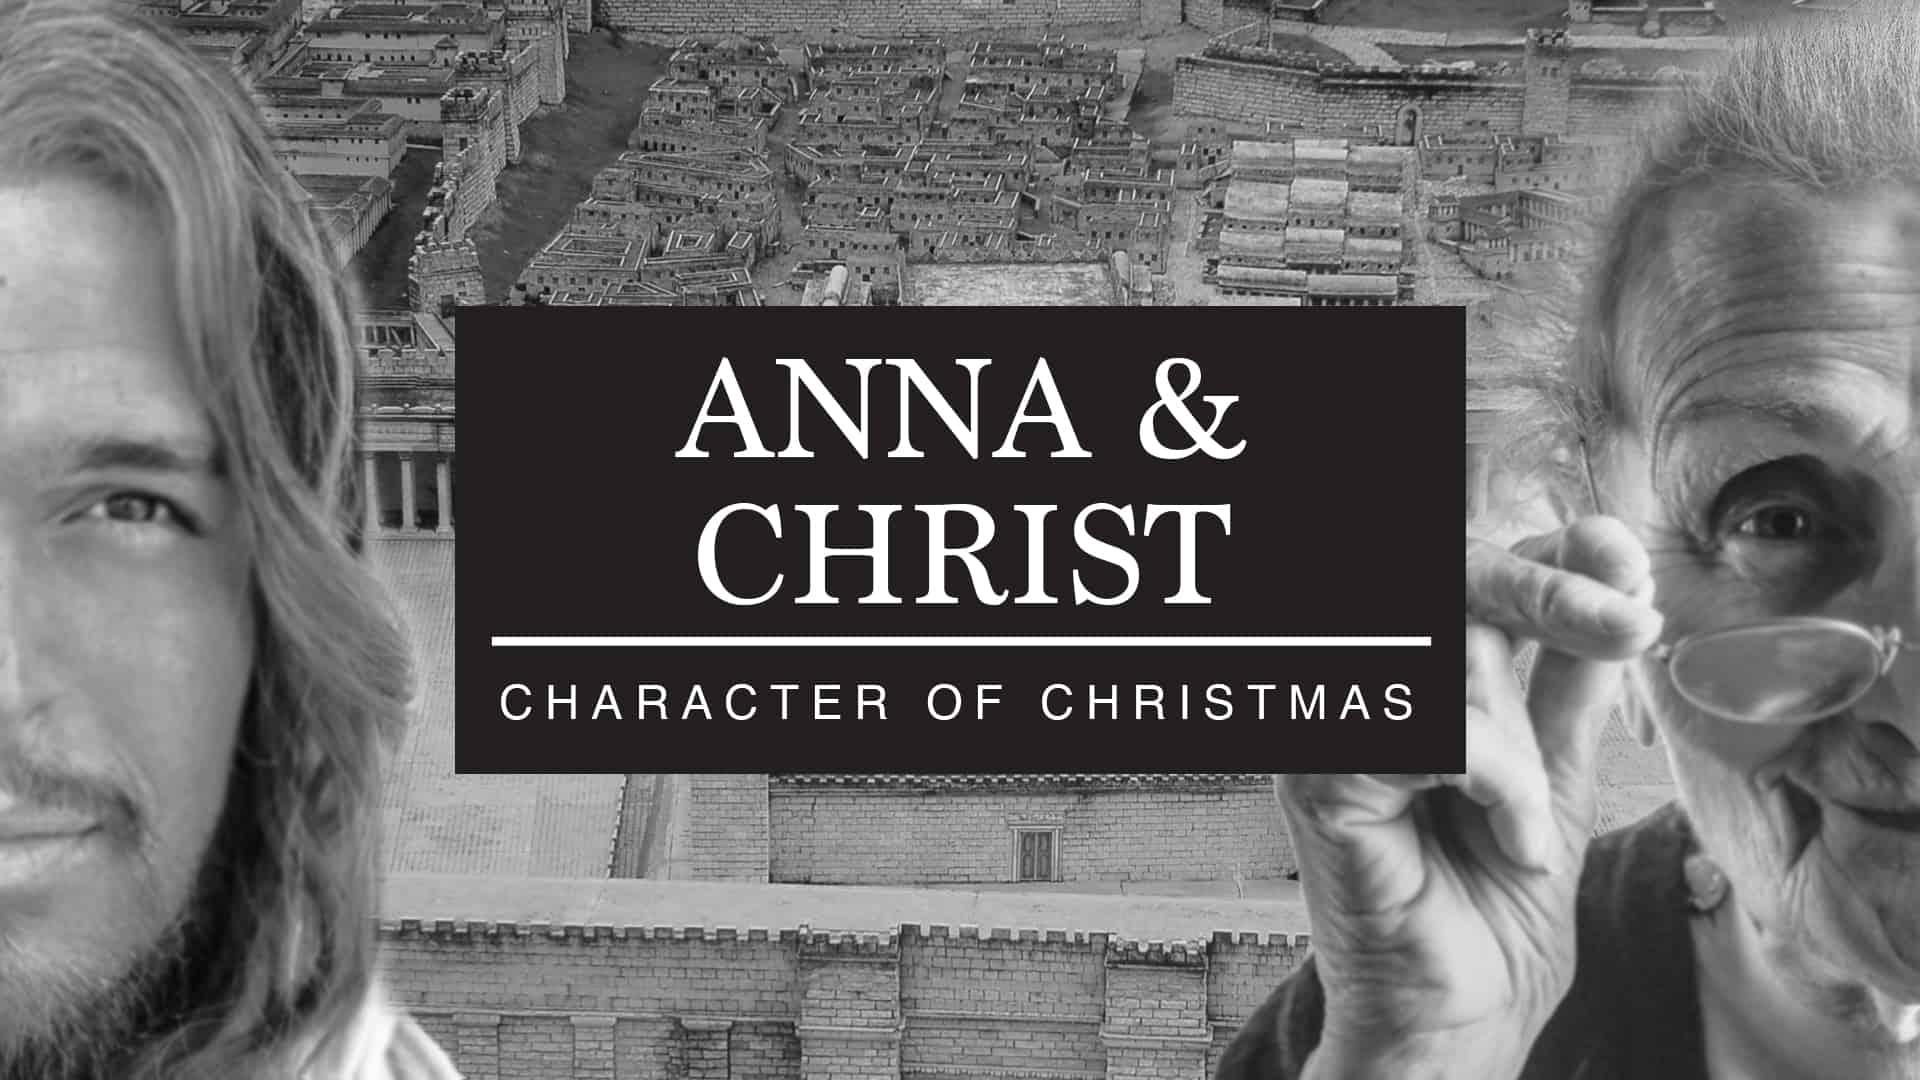 Anna & Christ